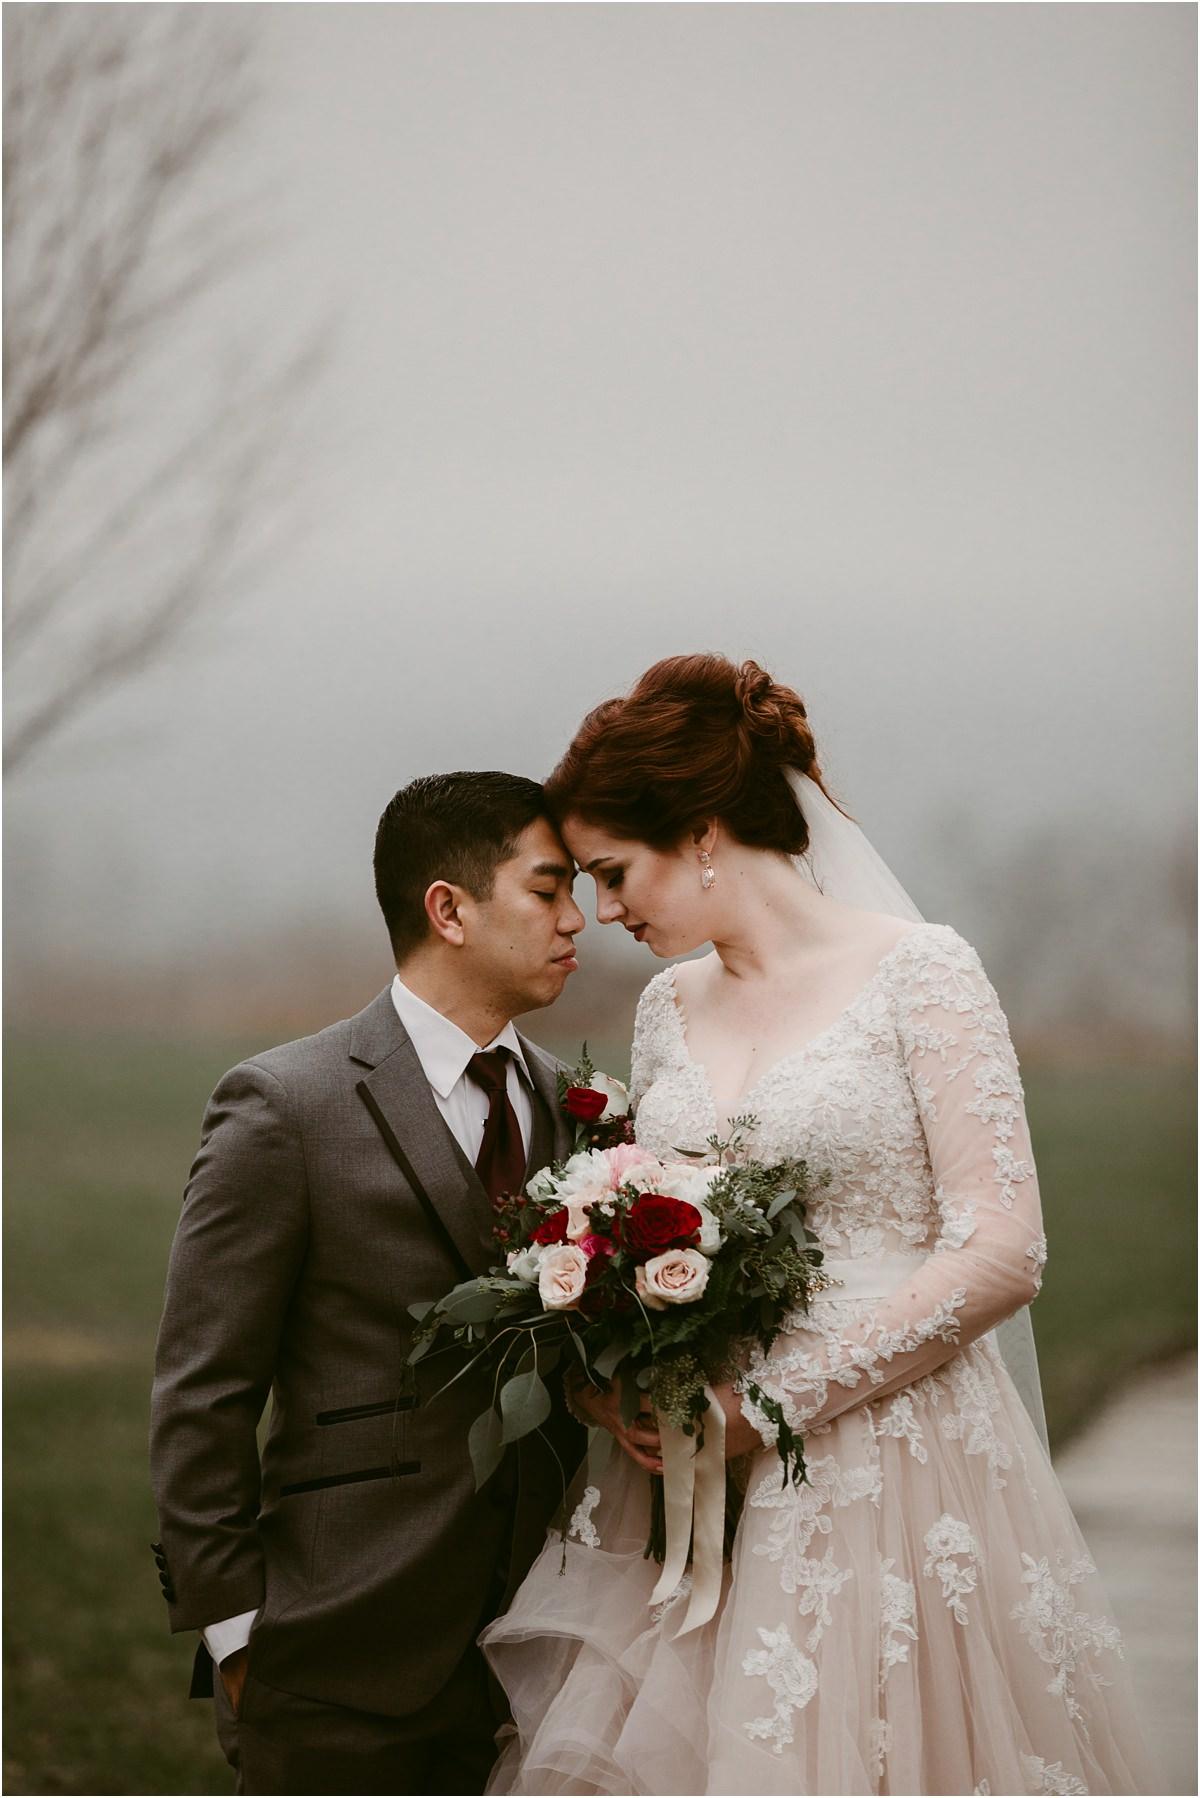 A romantic winter wedding at the patrick henry ballroom in roanoke virginia